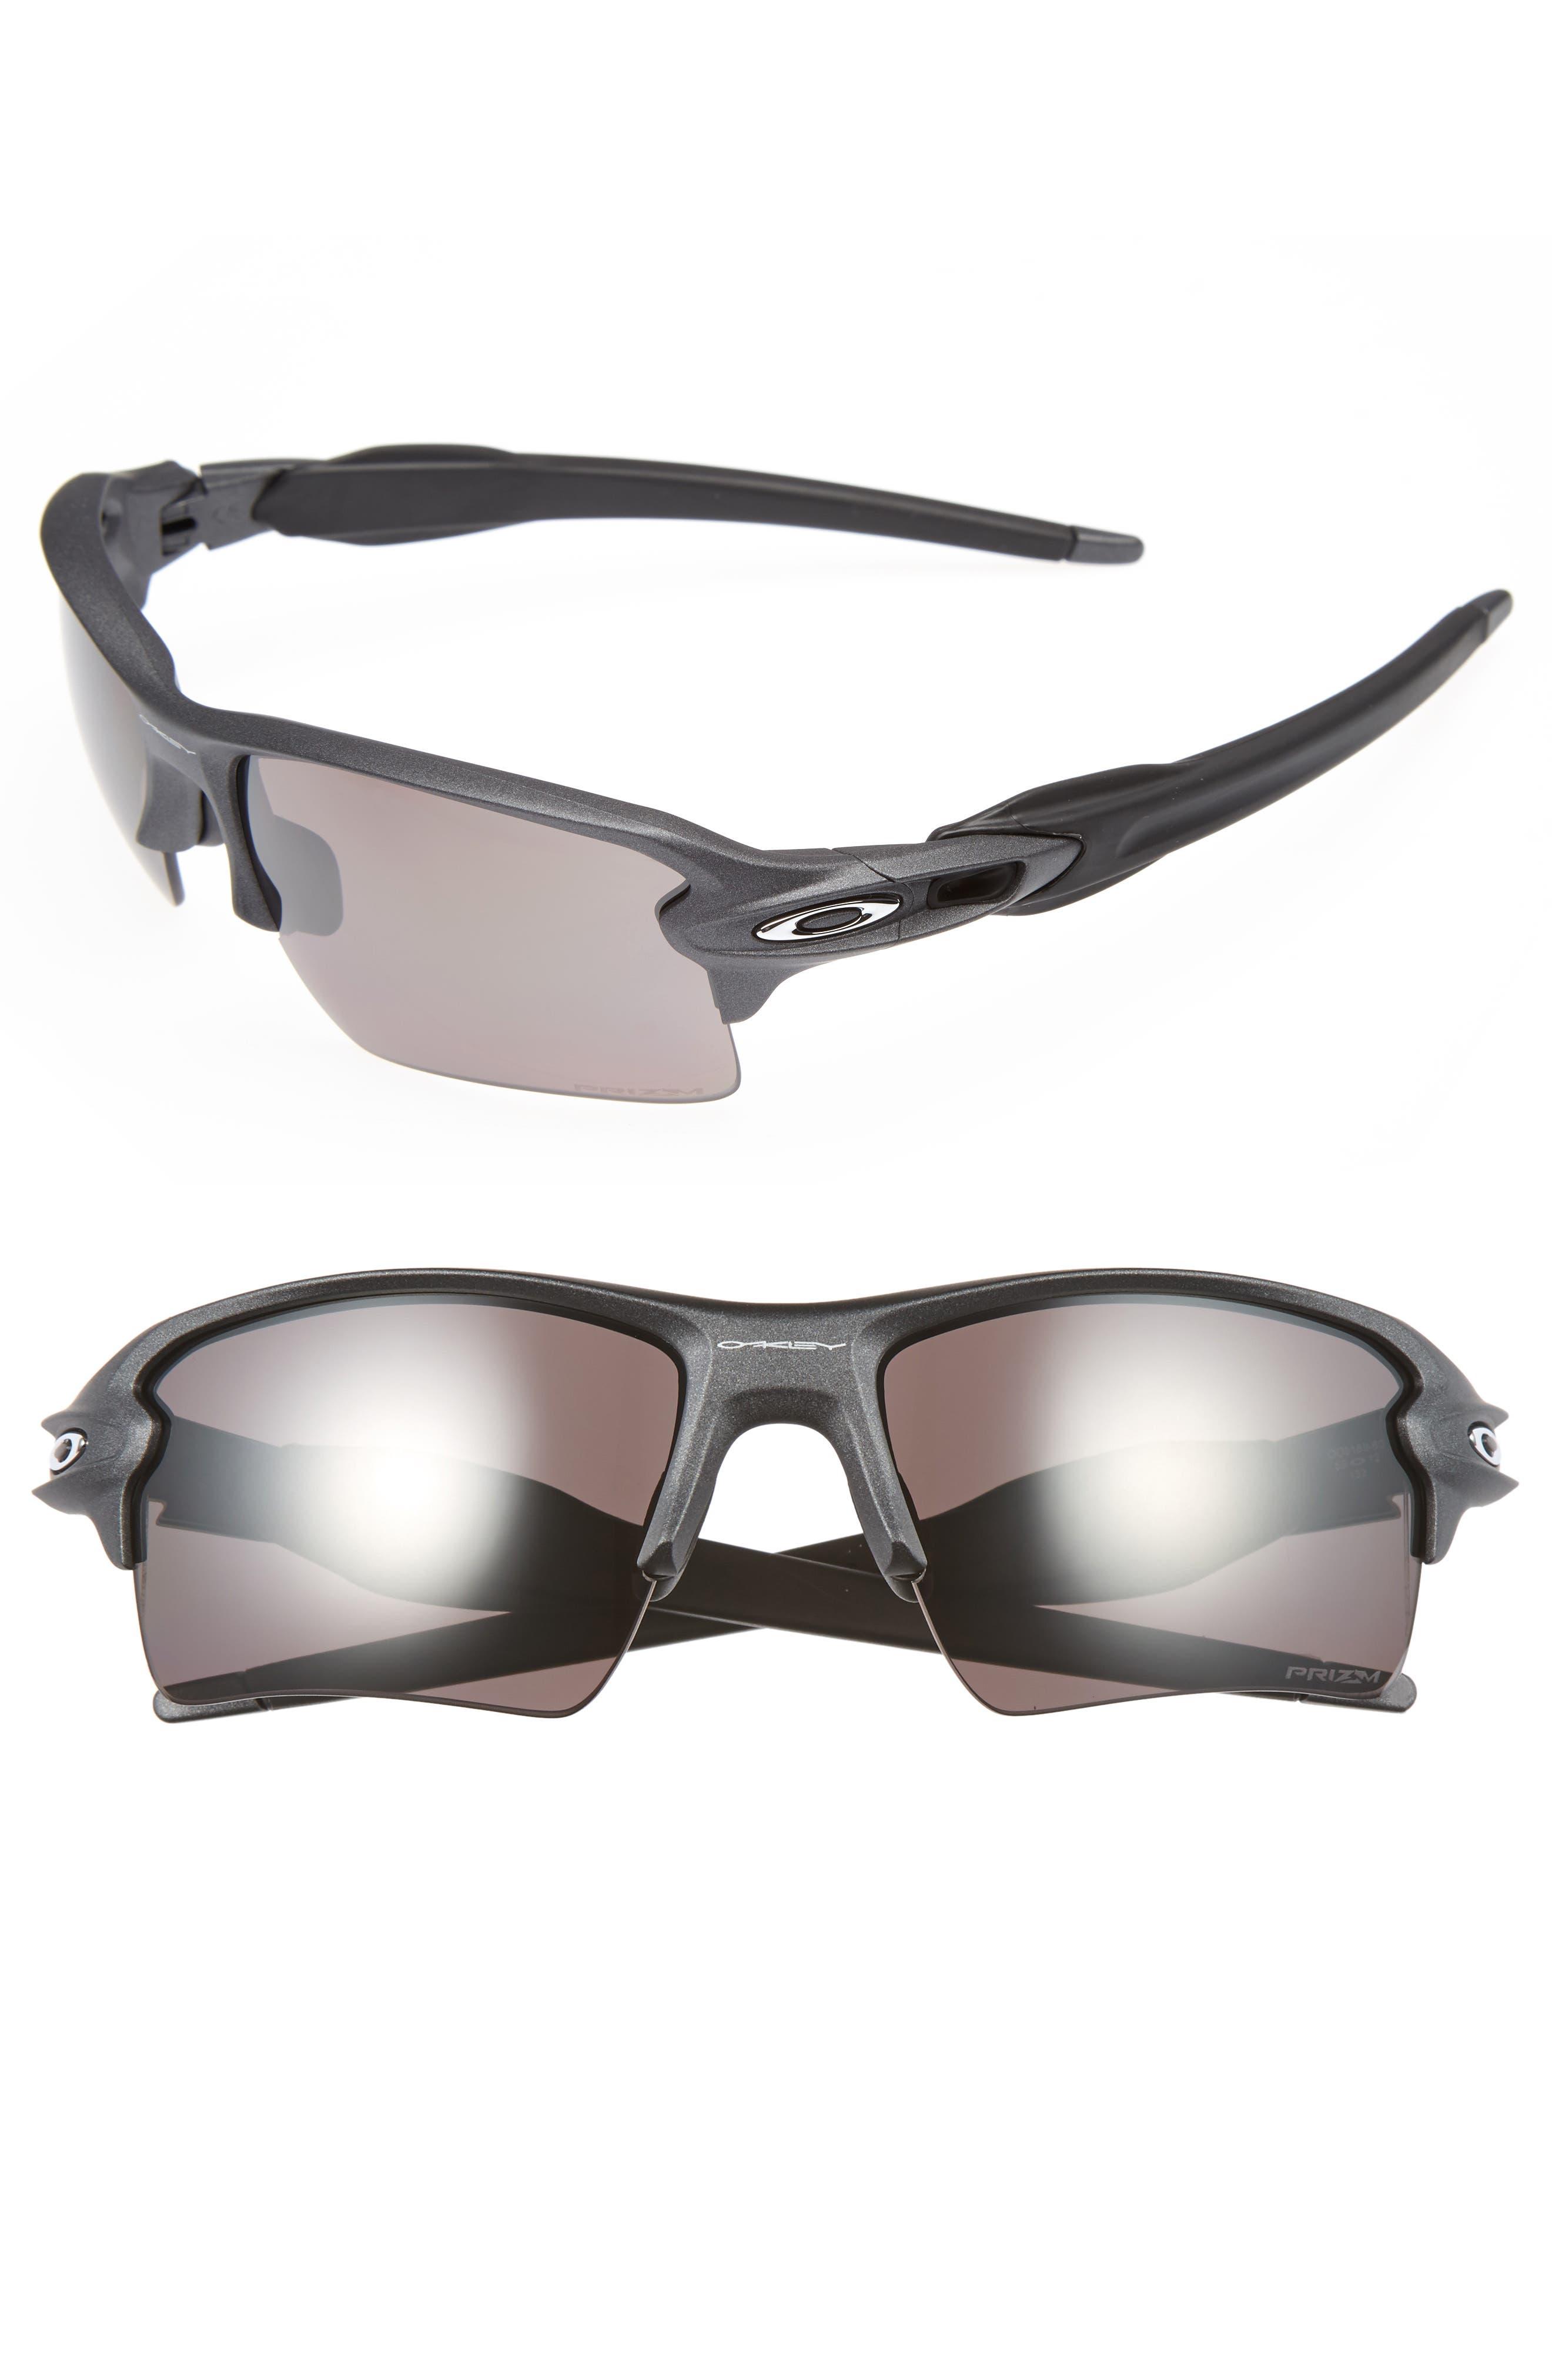 Flak 2.0 XL 59mm Polarized Sunglasses,                         Main,                         color, 020